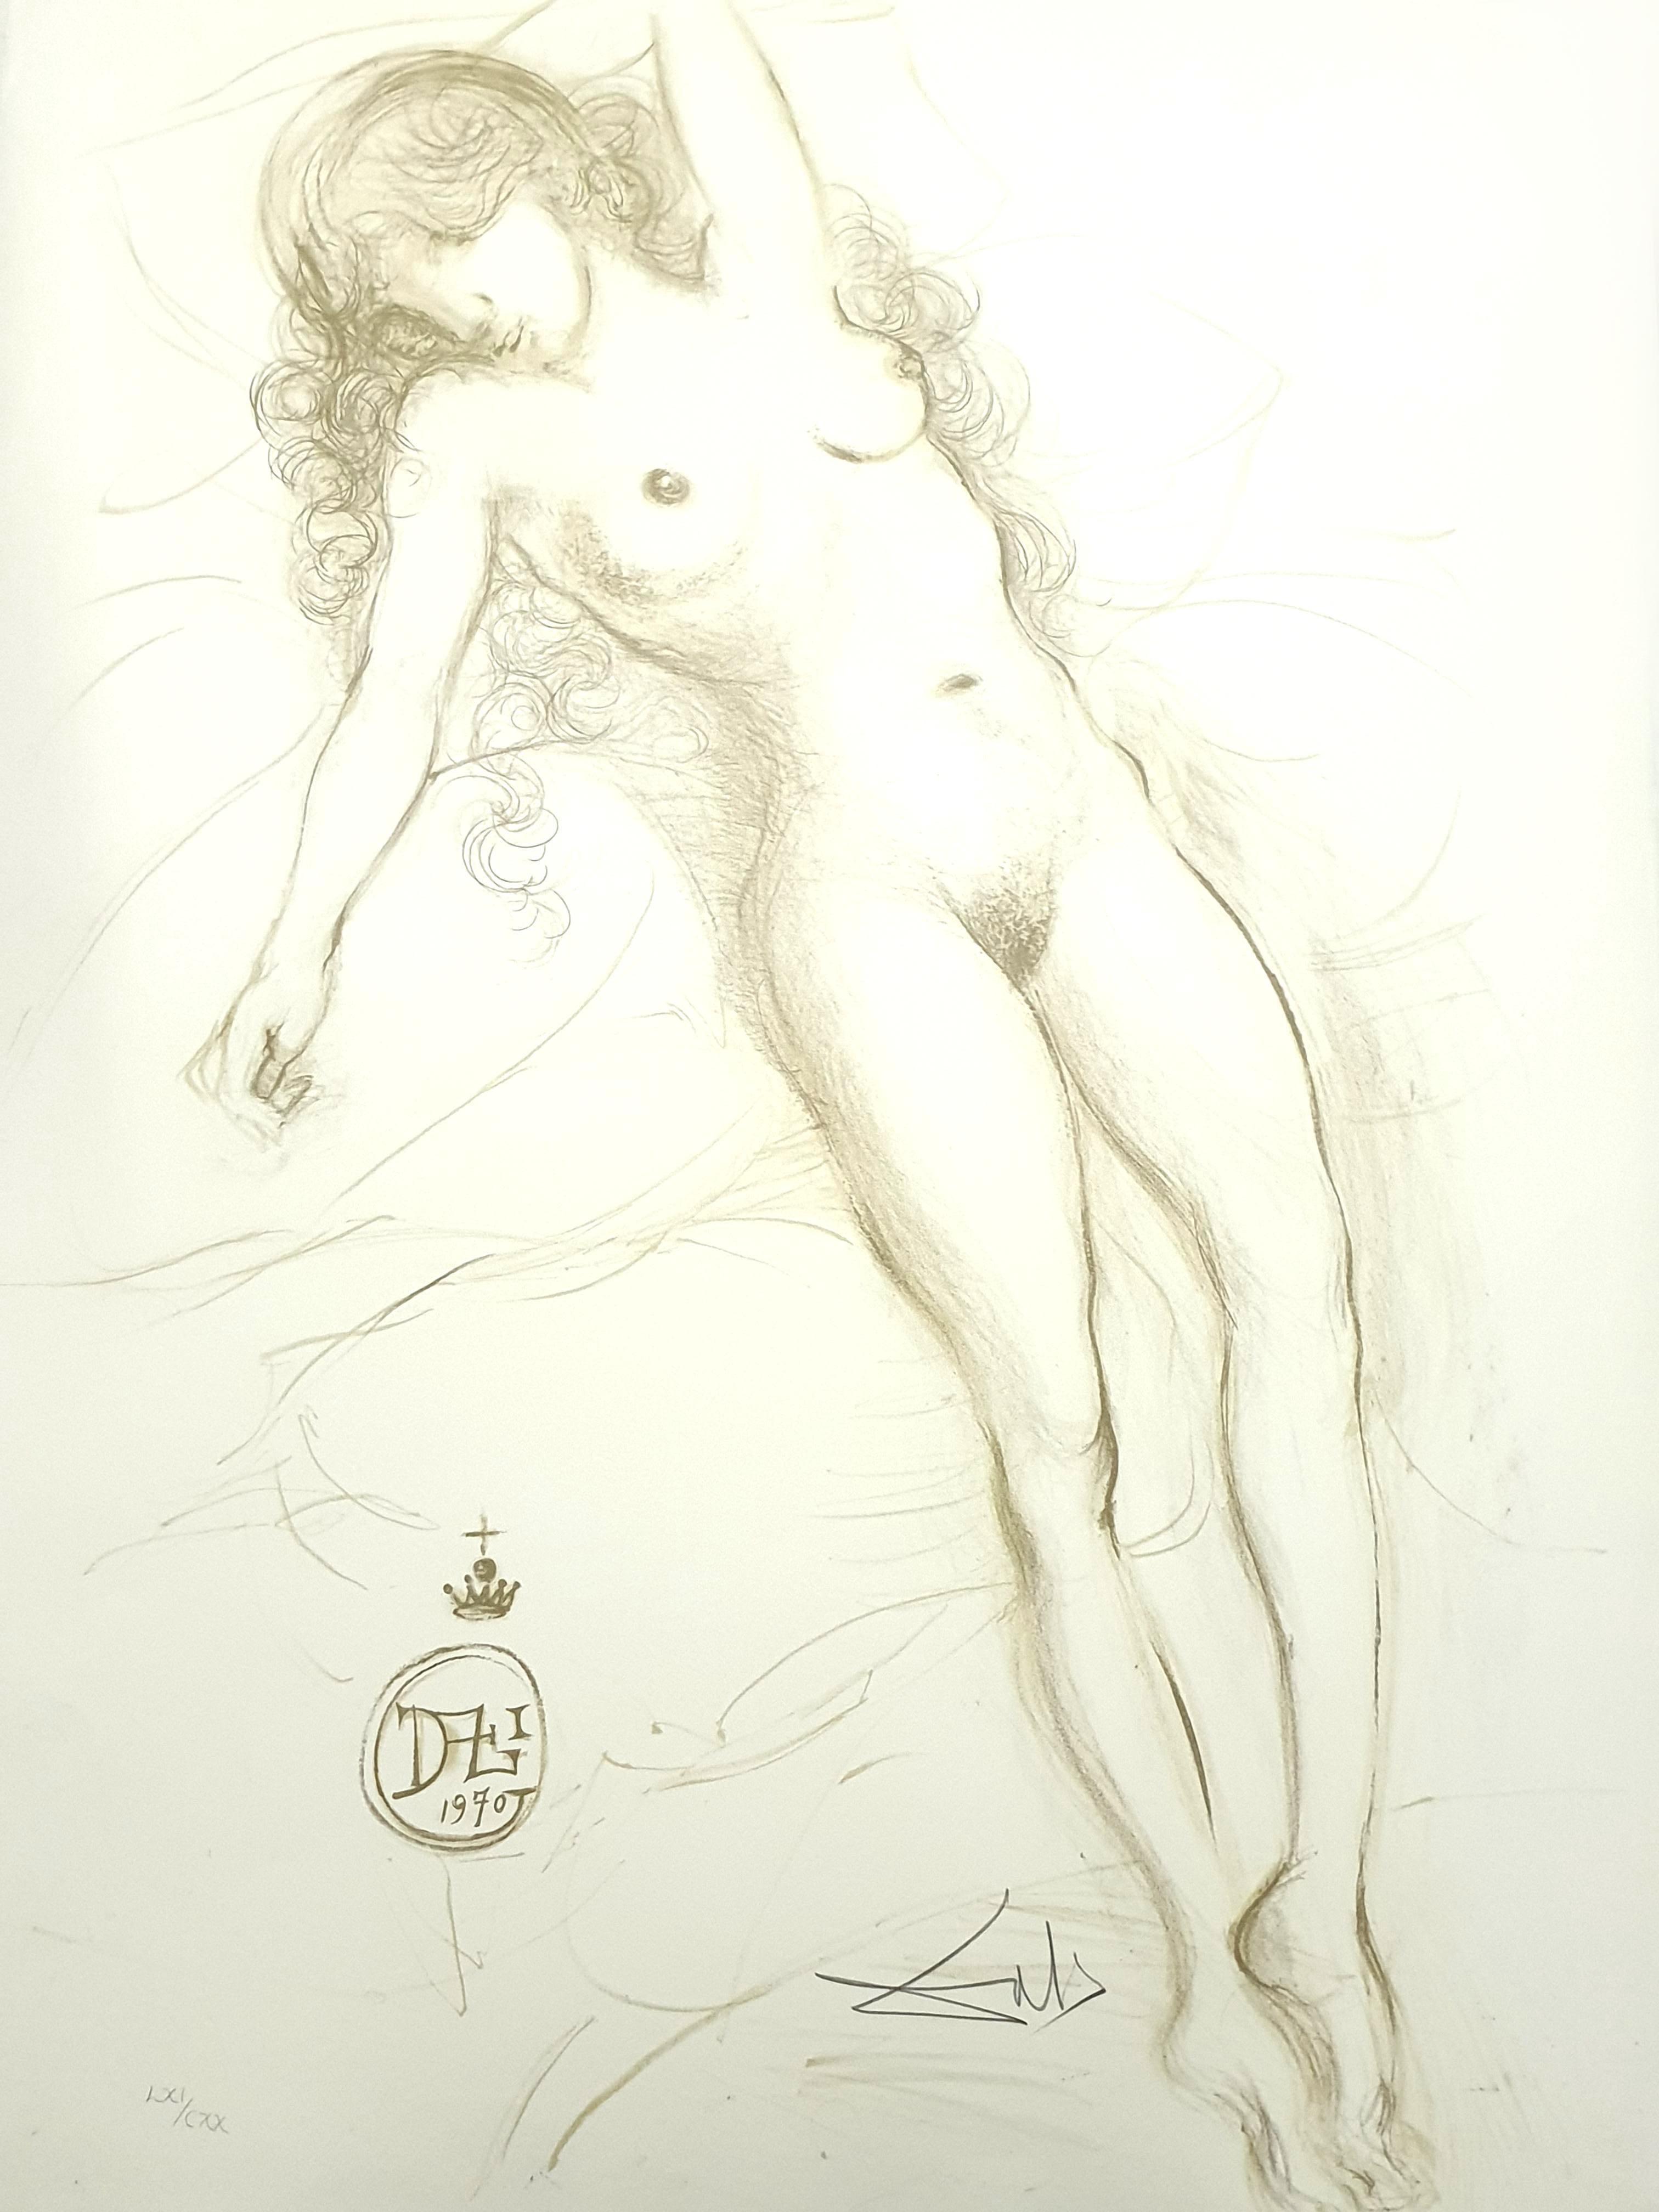 Salvador Dali - Nude with Raised Arms - Original Handsigned Lithograph